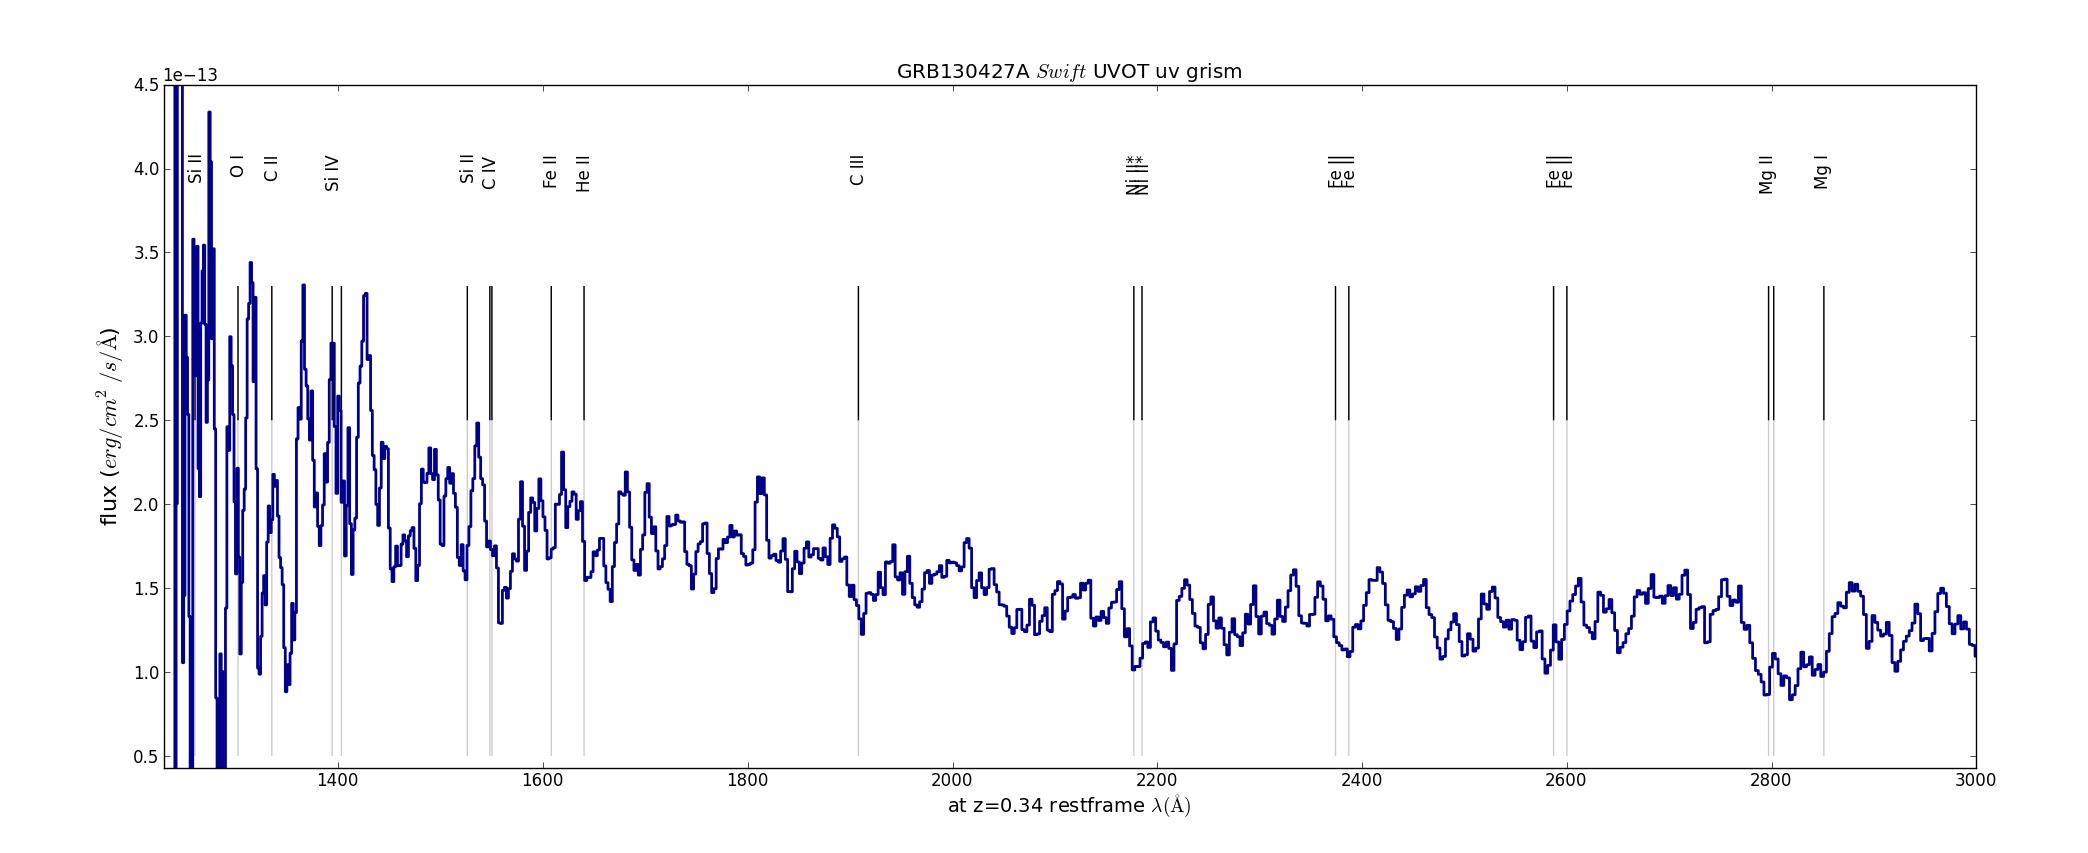 GRB 130427A Swift UVOT uv grism spectrum: the deconvolution